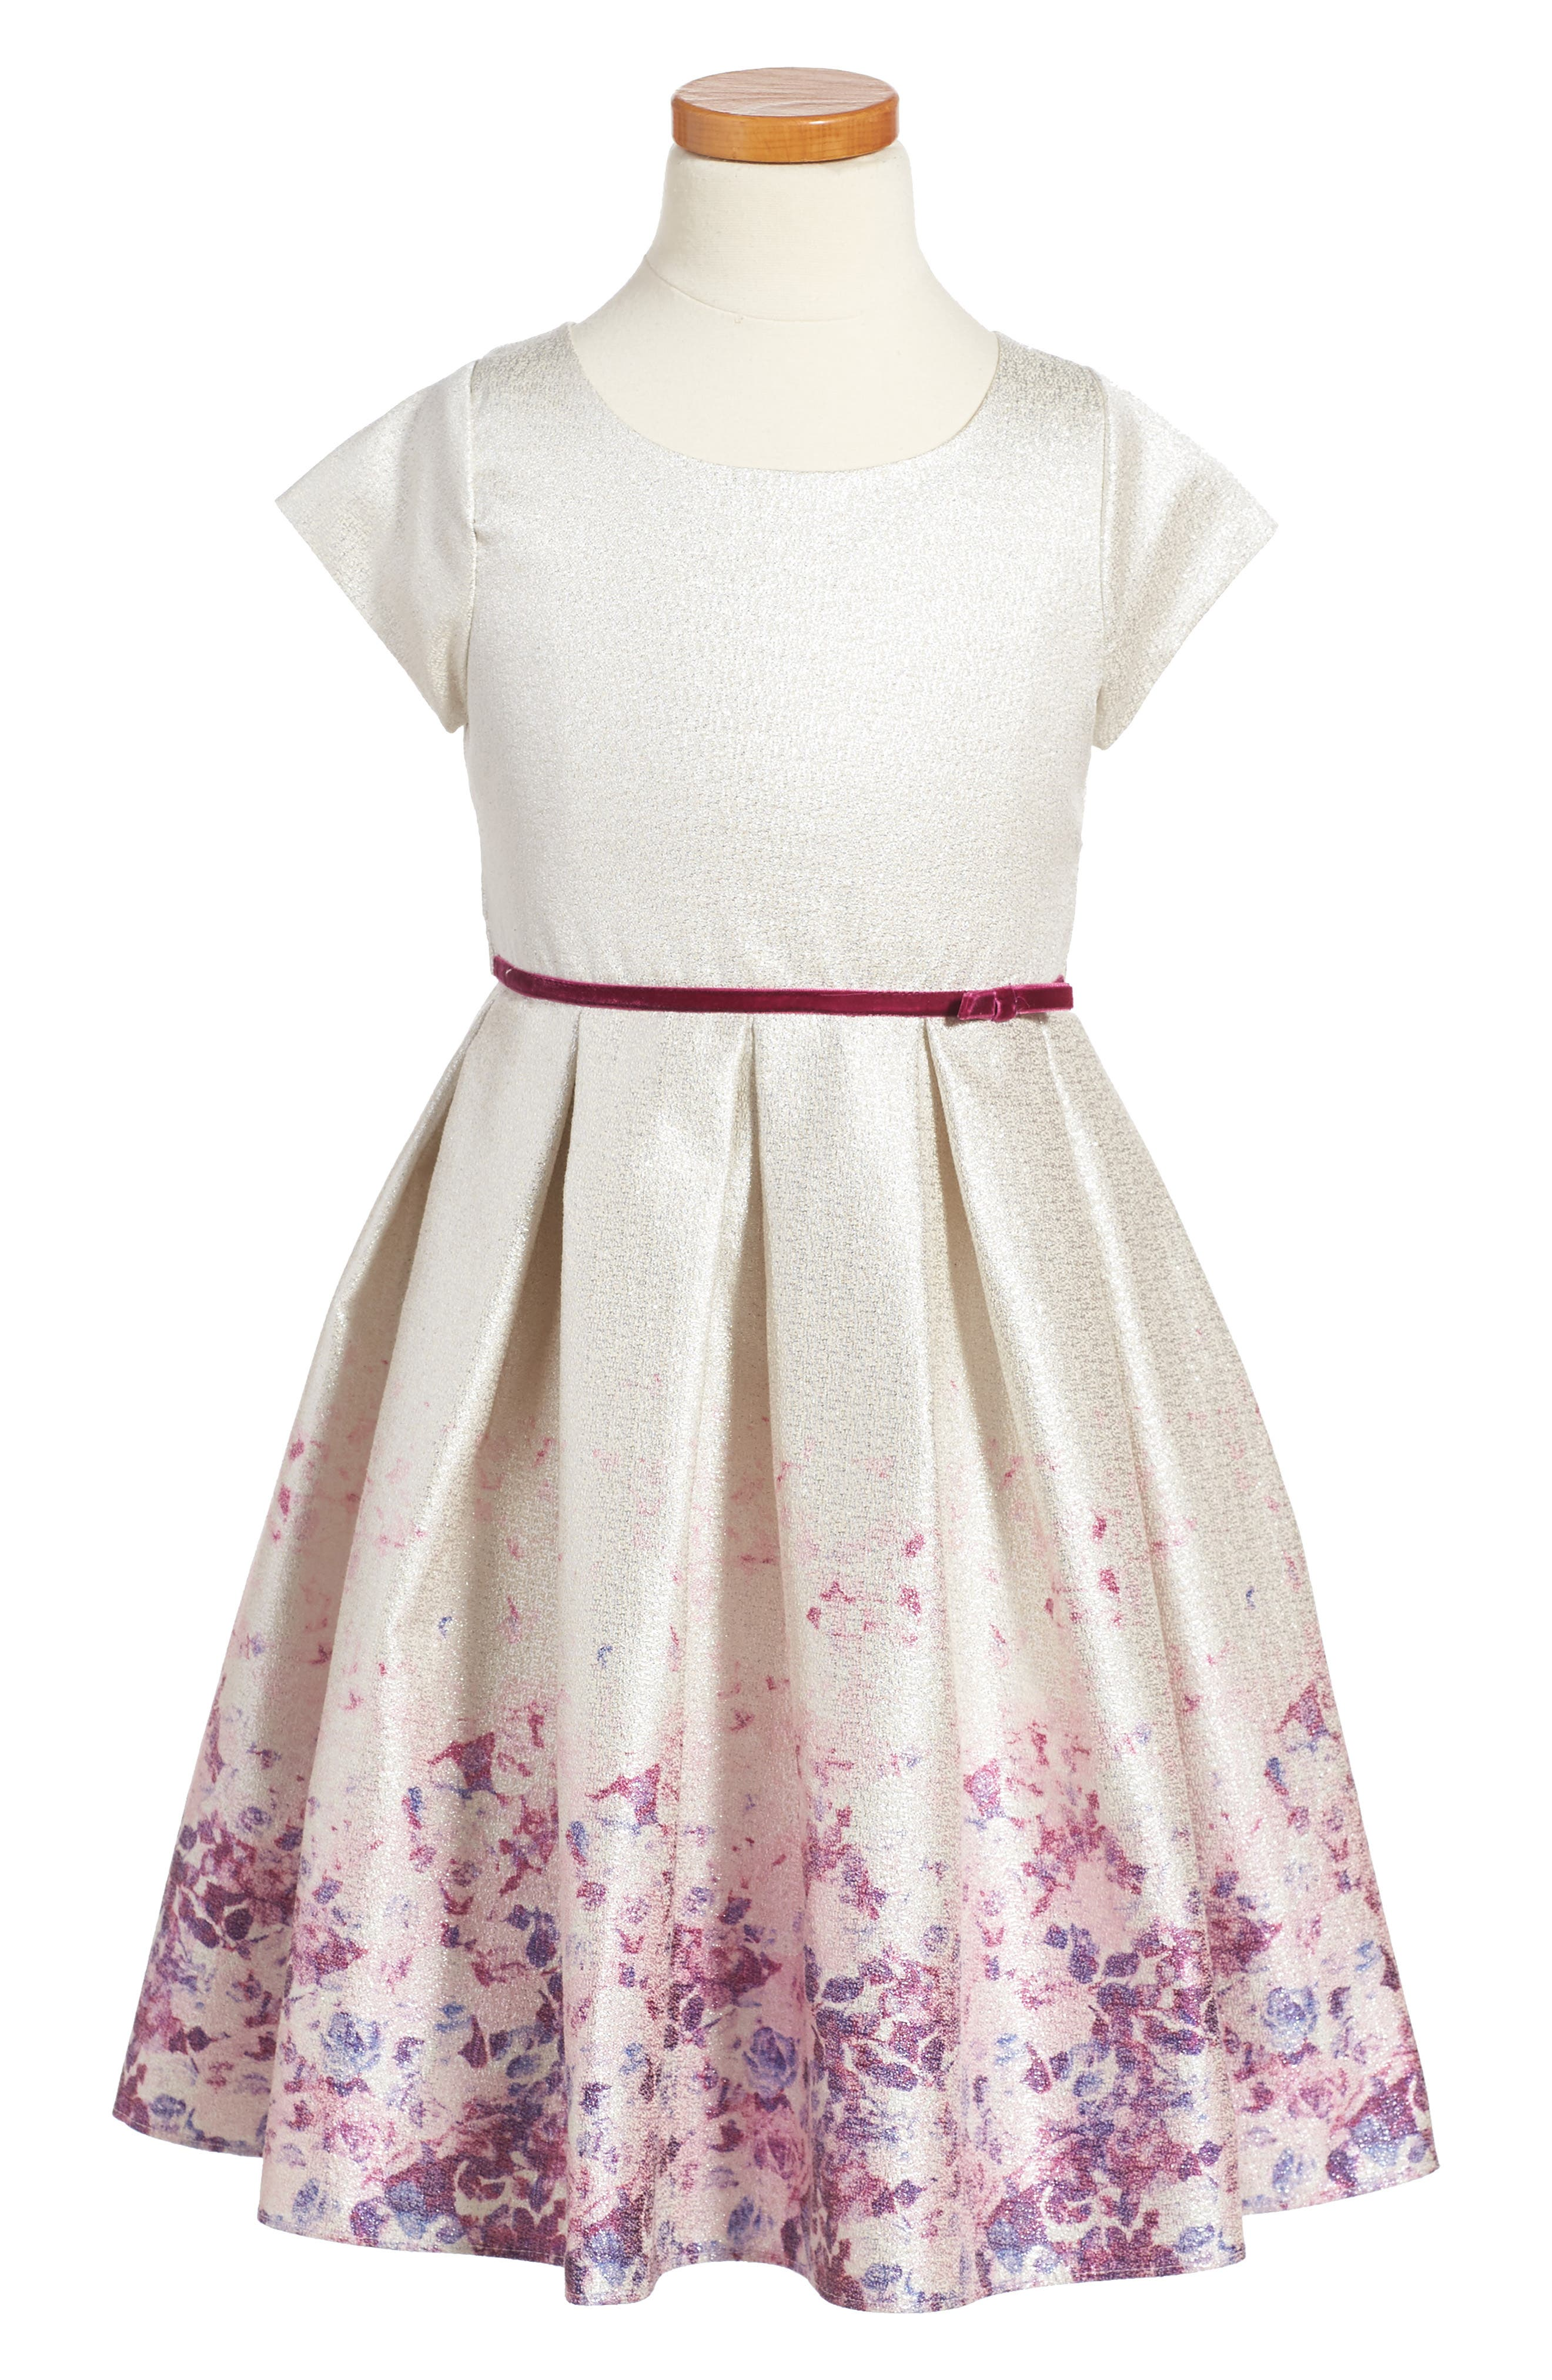 Alternate Image 1 Selected - Dorissa Liza Dress (Toddler Girls, Little Girls & Big Girls)